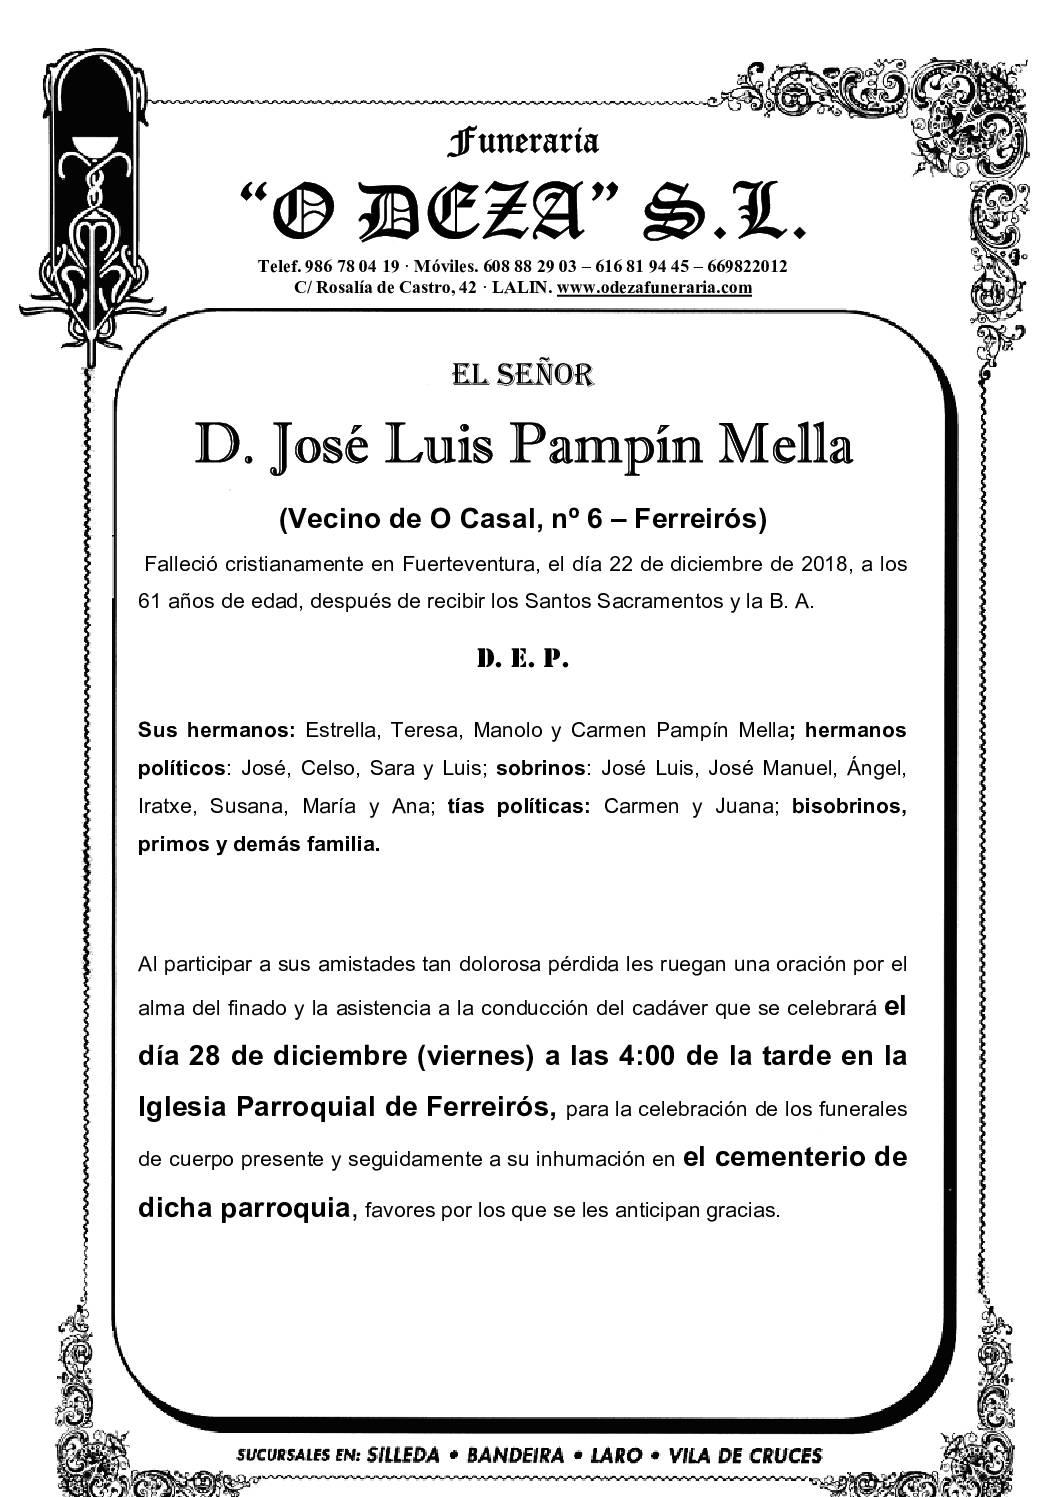 D. JOSÉ LUIS PAMPÍN MELLA